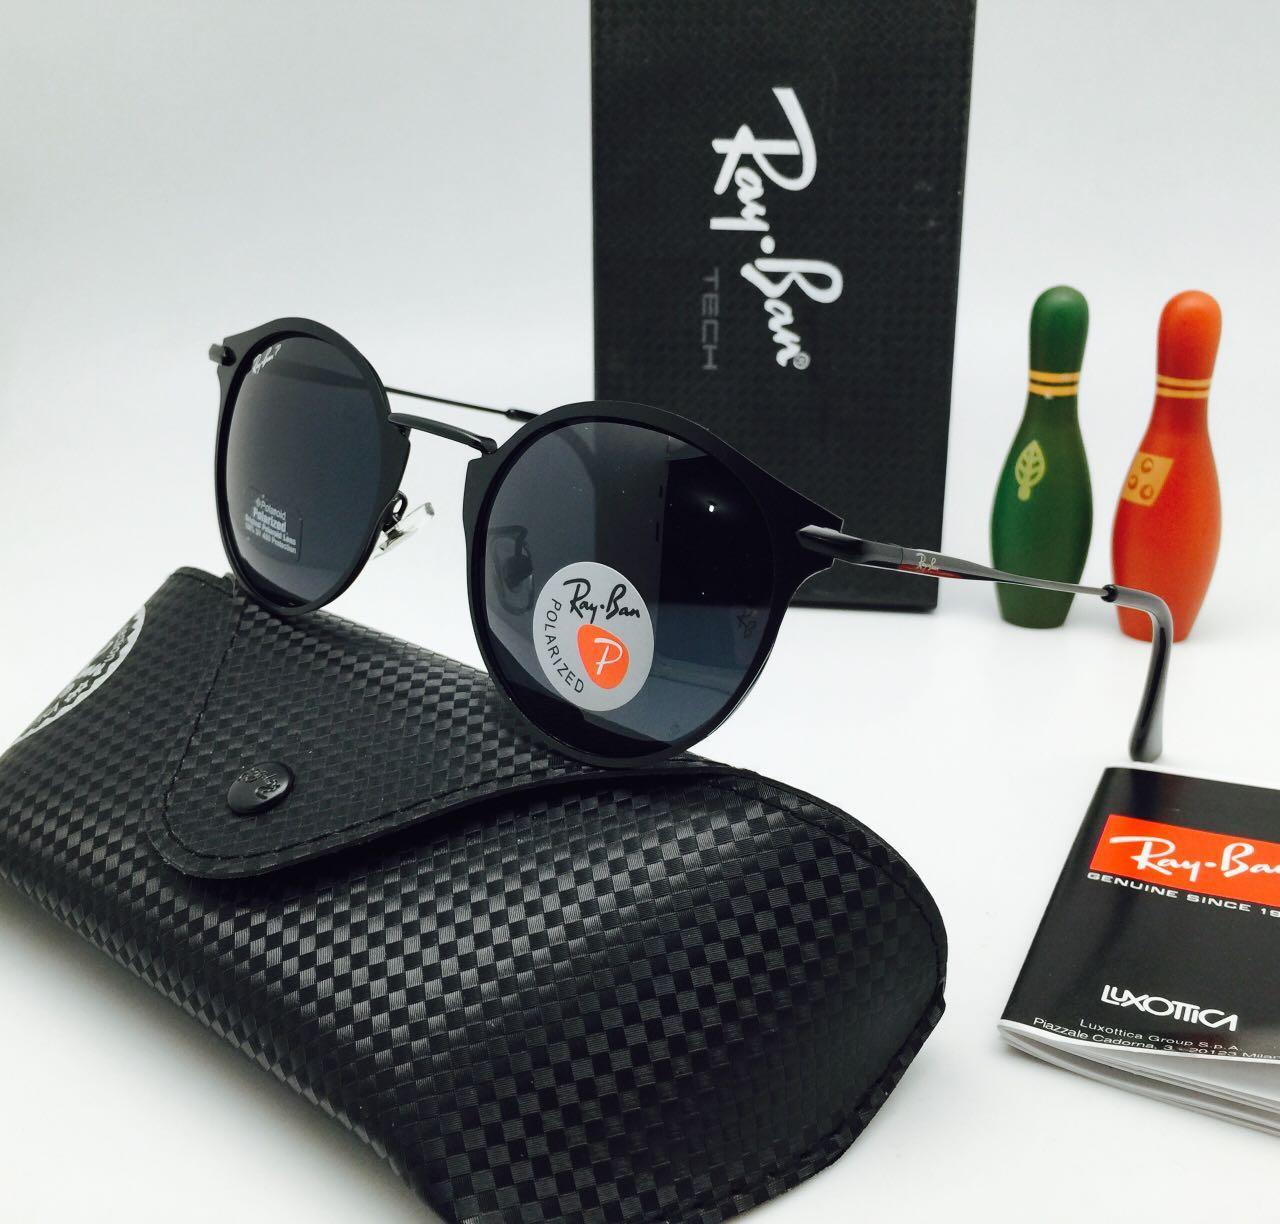 ... switzerland termurah kacamata rayban 4601 kacamata polarized best  quality 3 7b677 32e91 ee0495ff1e